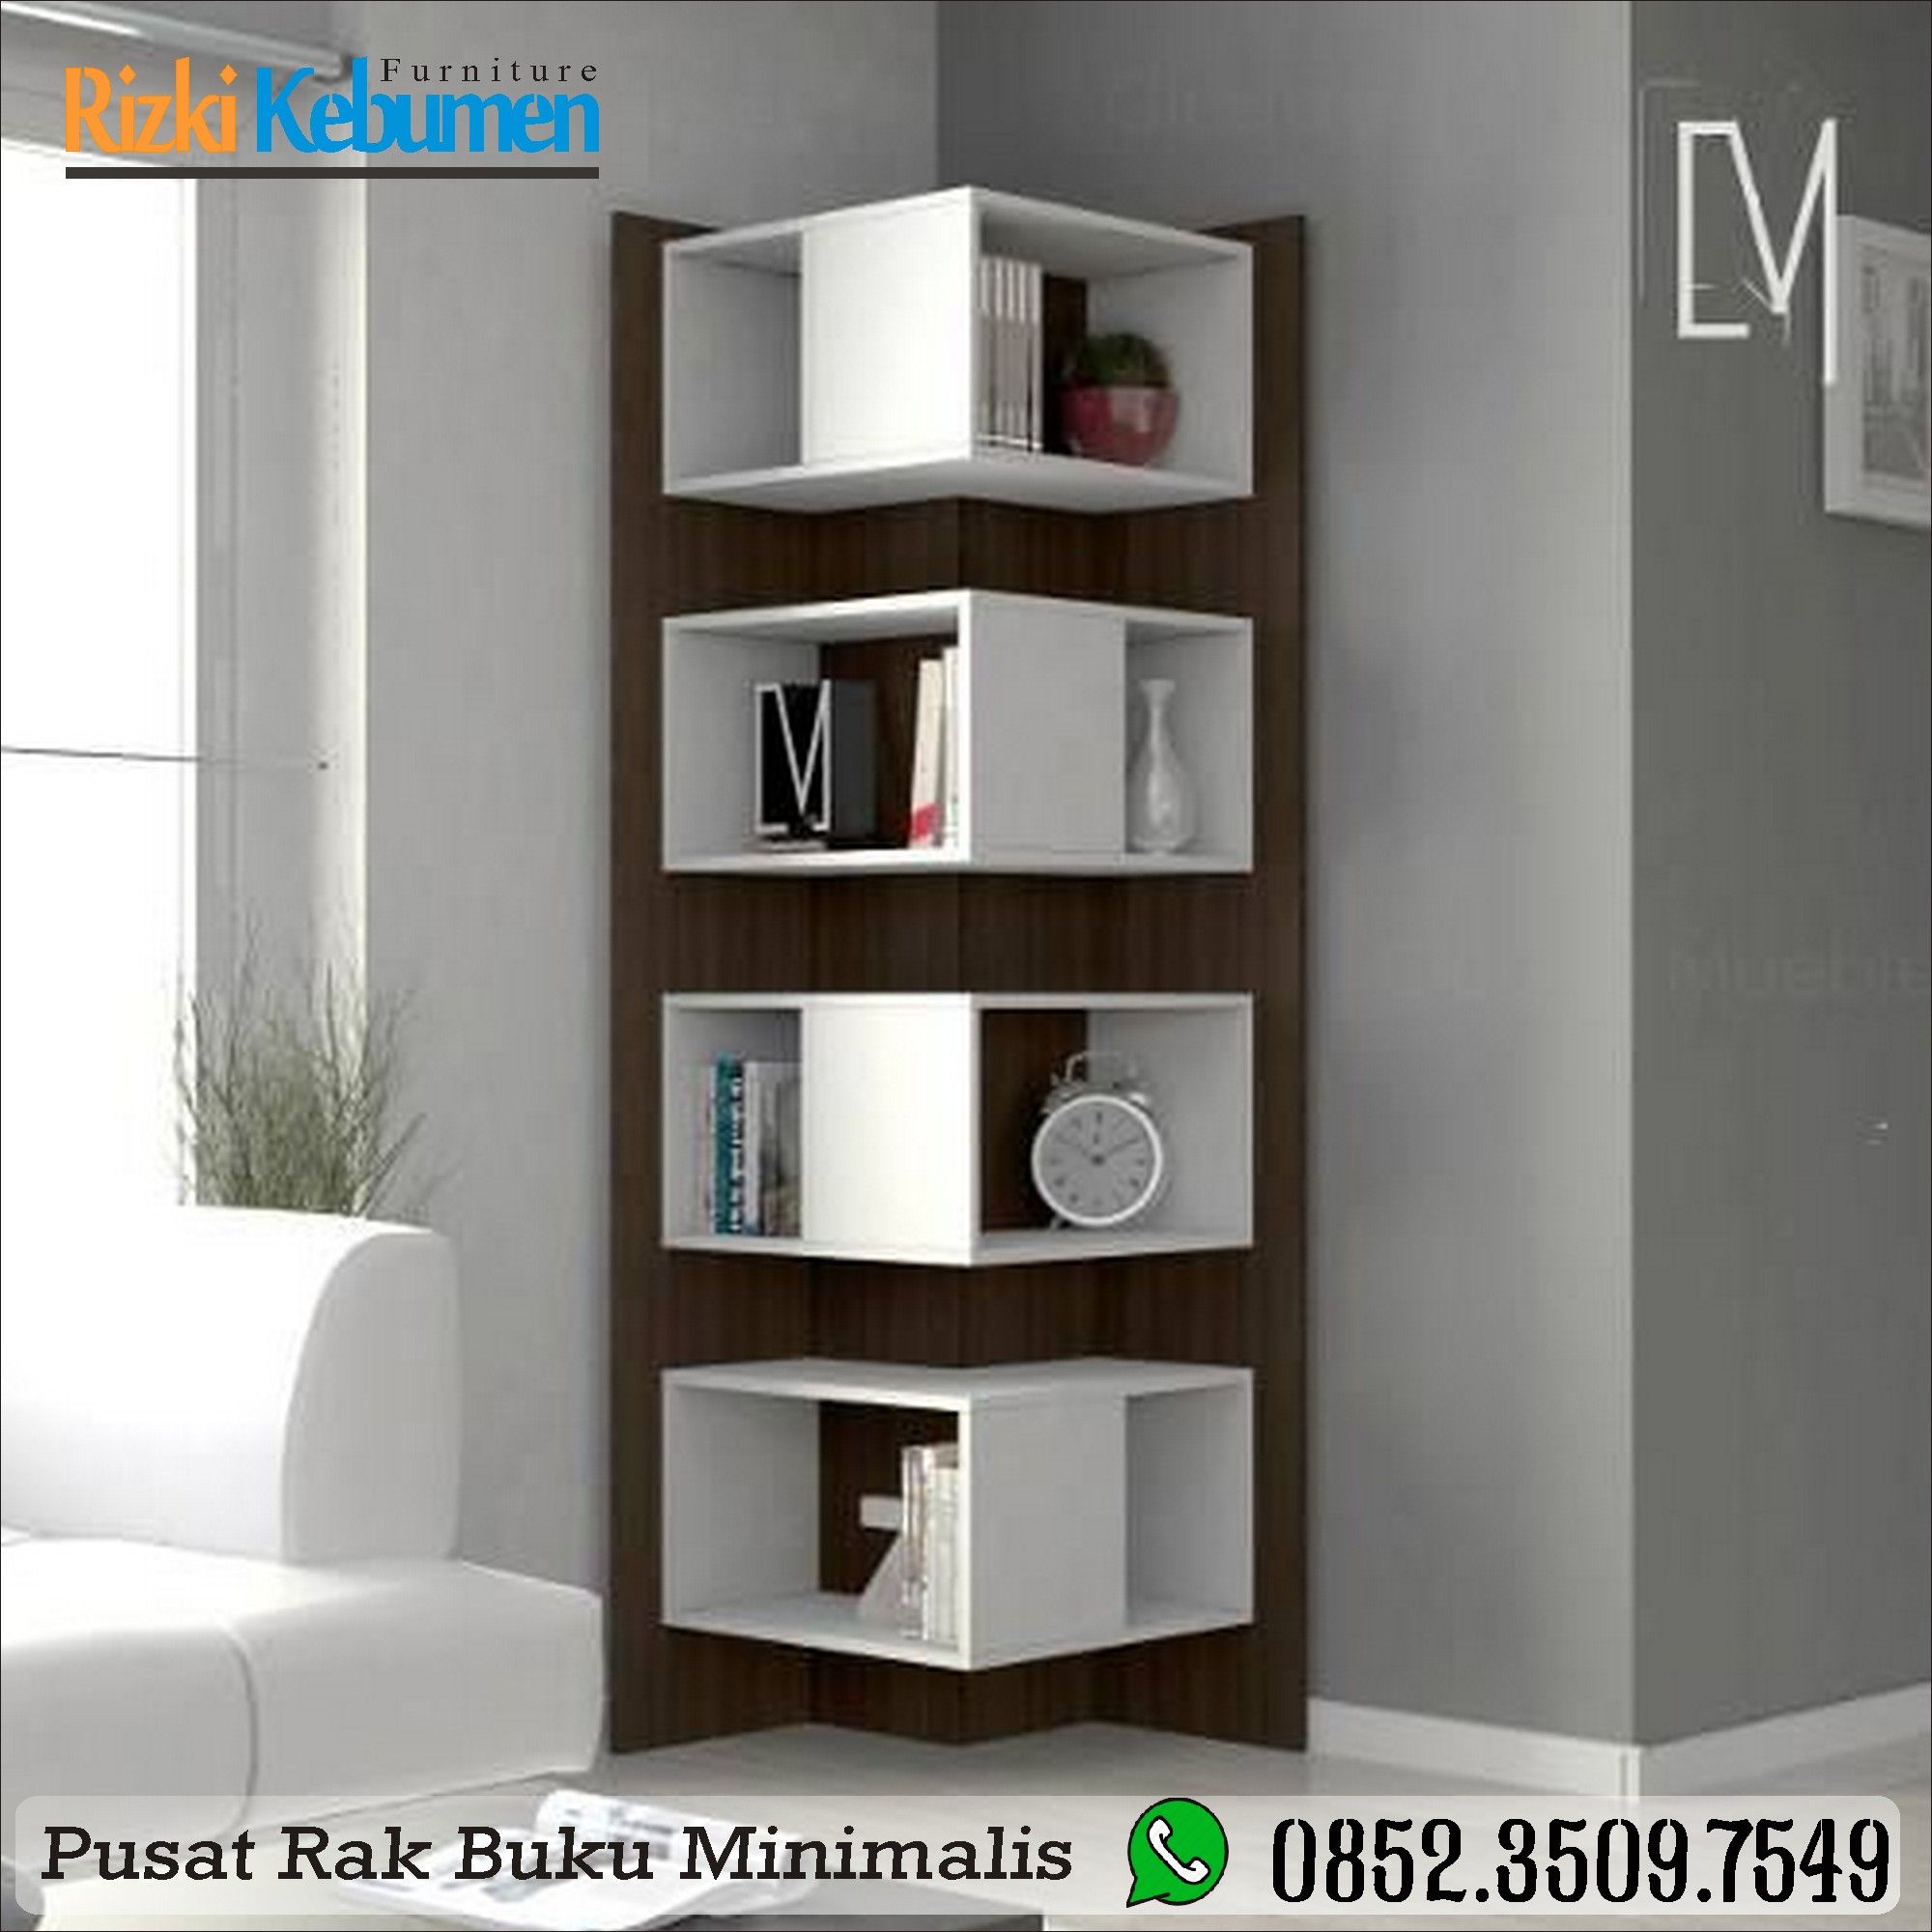 Rak buku custom bandung rak buku modern minimalis rak buku jambi rak buku merk expo informasi pemesanan no hp 0852 3509 7549 wa telf kami melayani